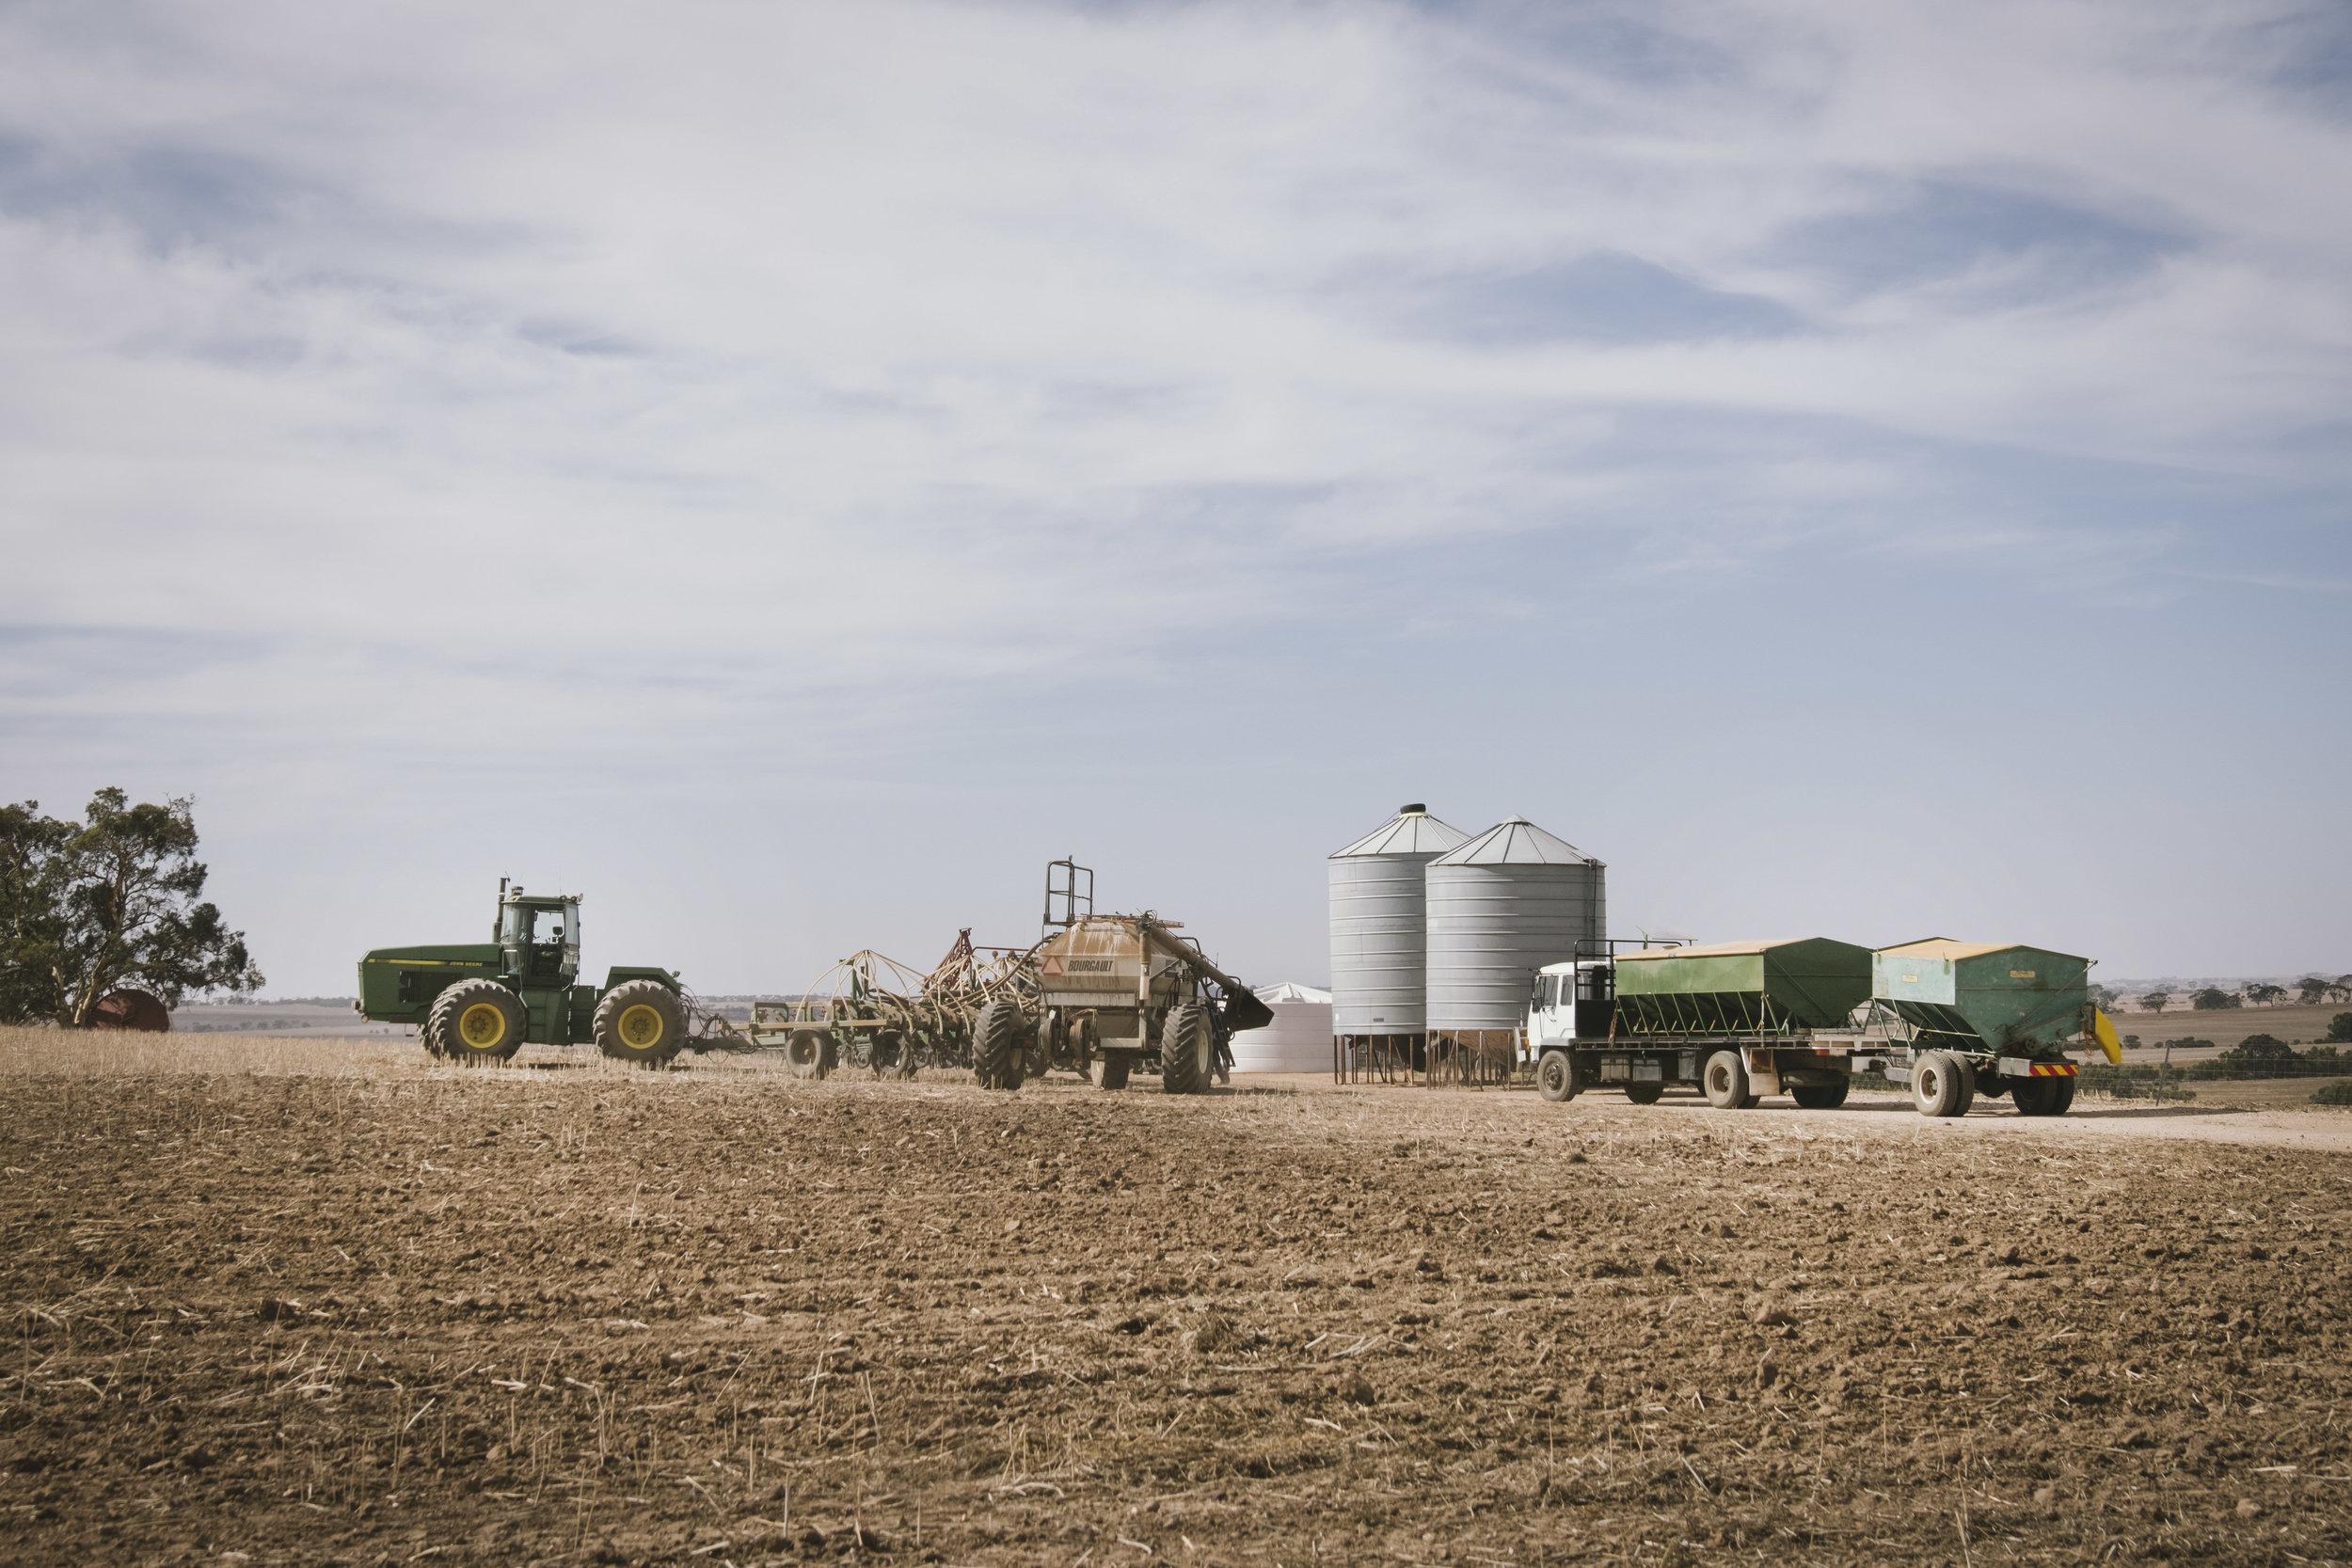 Angie Roe Photography Wheatbelt Rural Farm Landscape Seeding (3).jpg